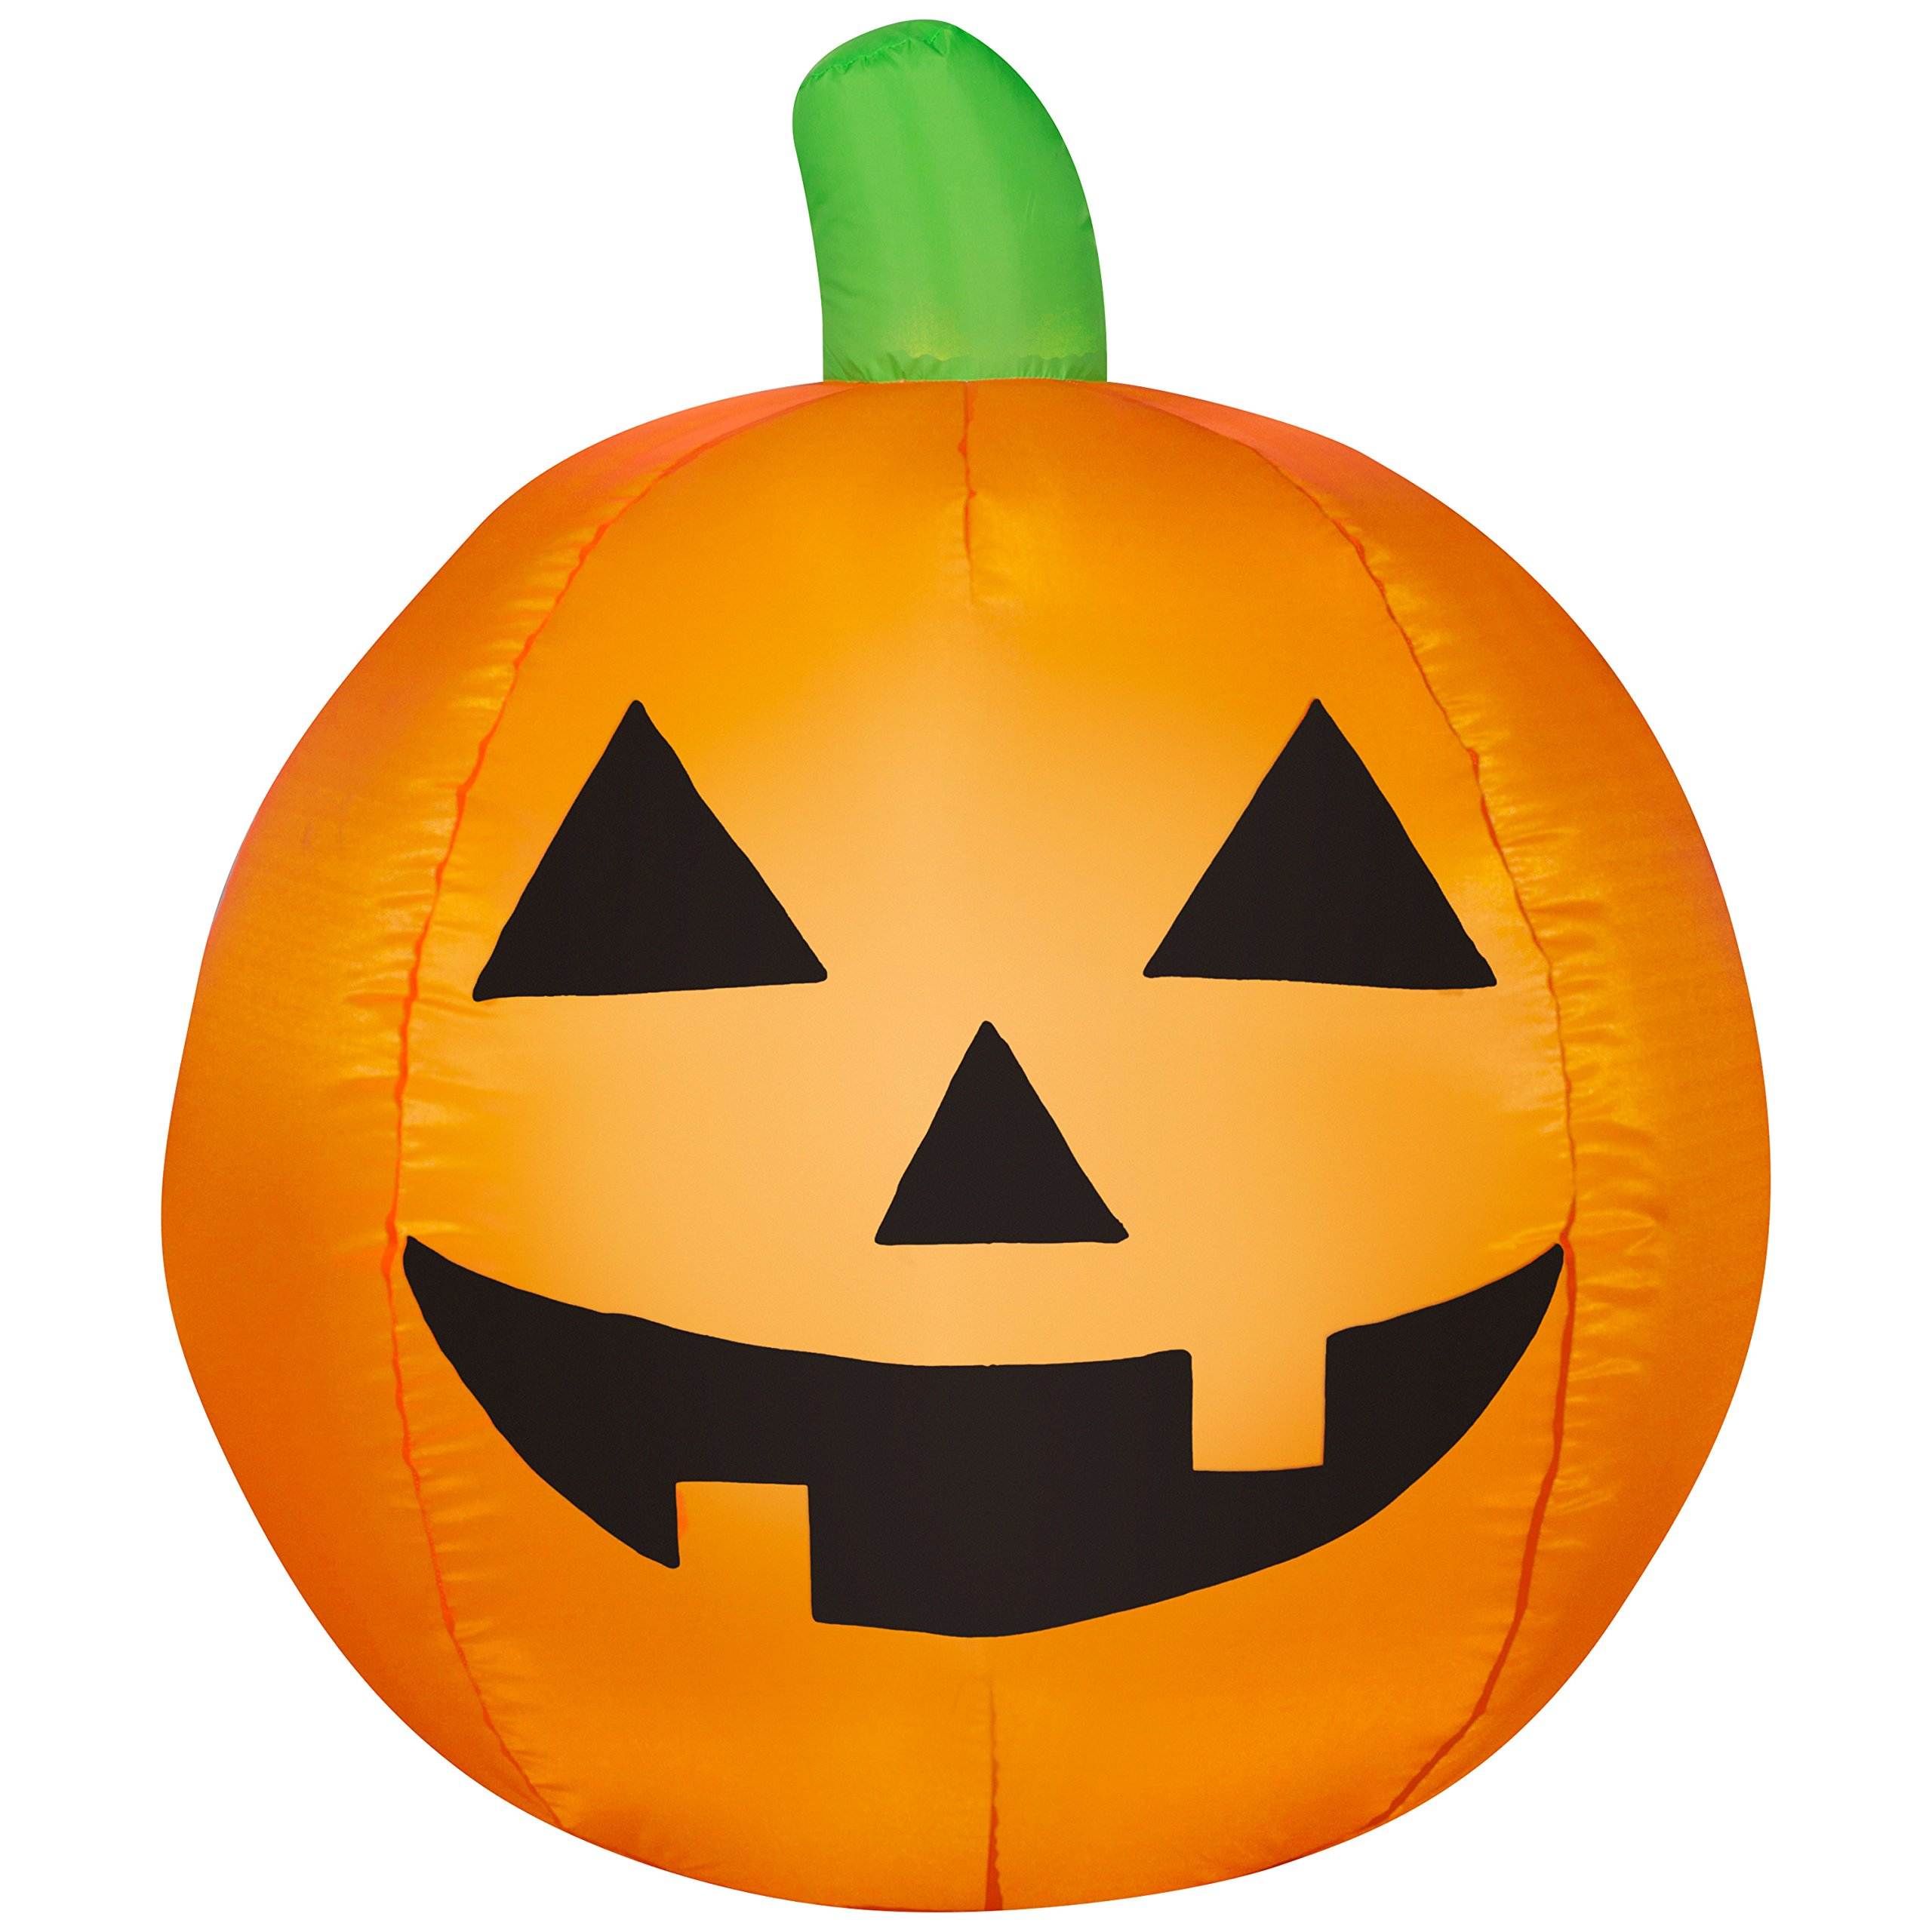 Halloween Pumpkin Airblown Inflatable Jack-O-Lantern 3 Feet